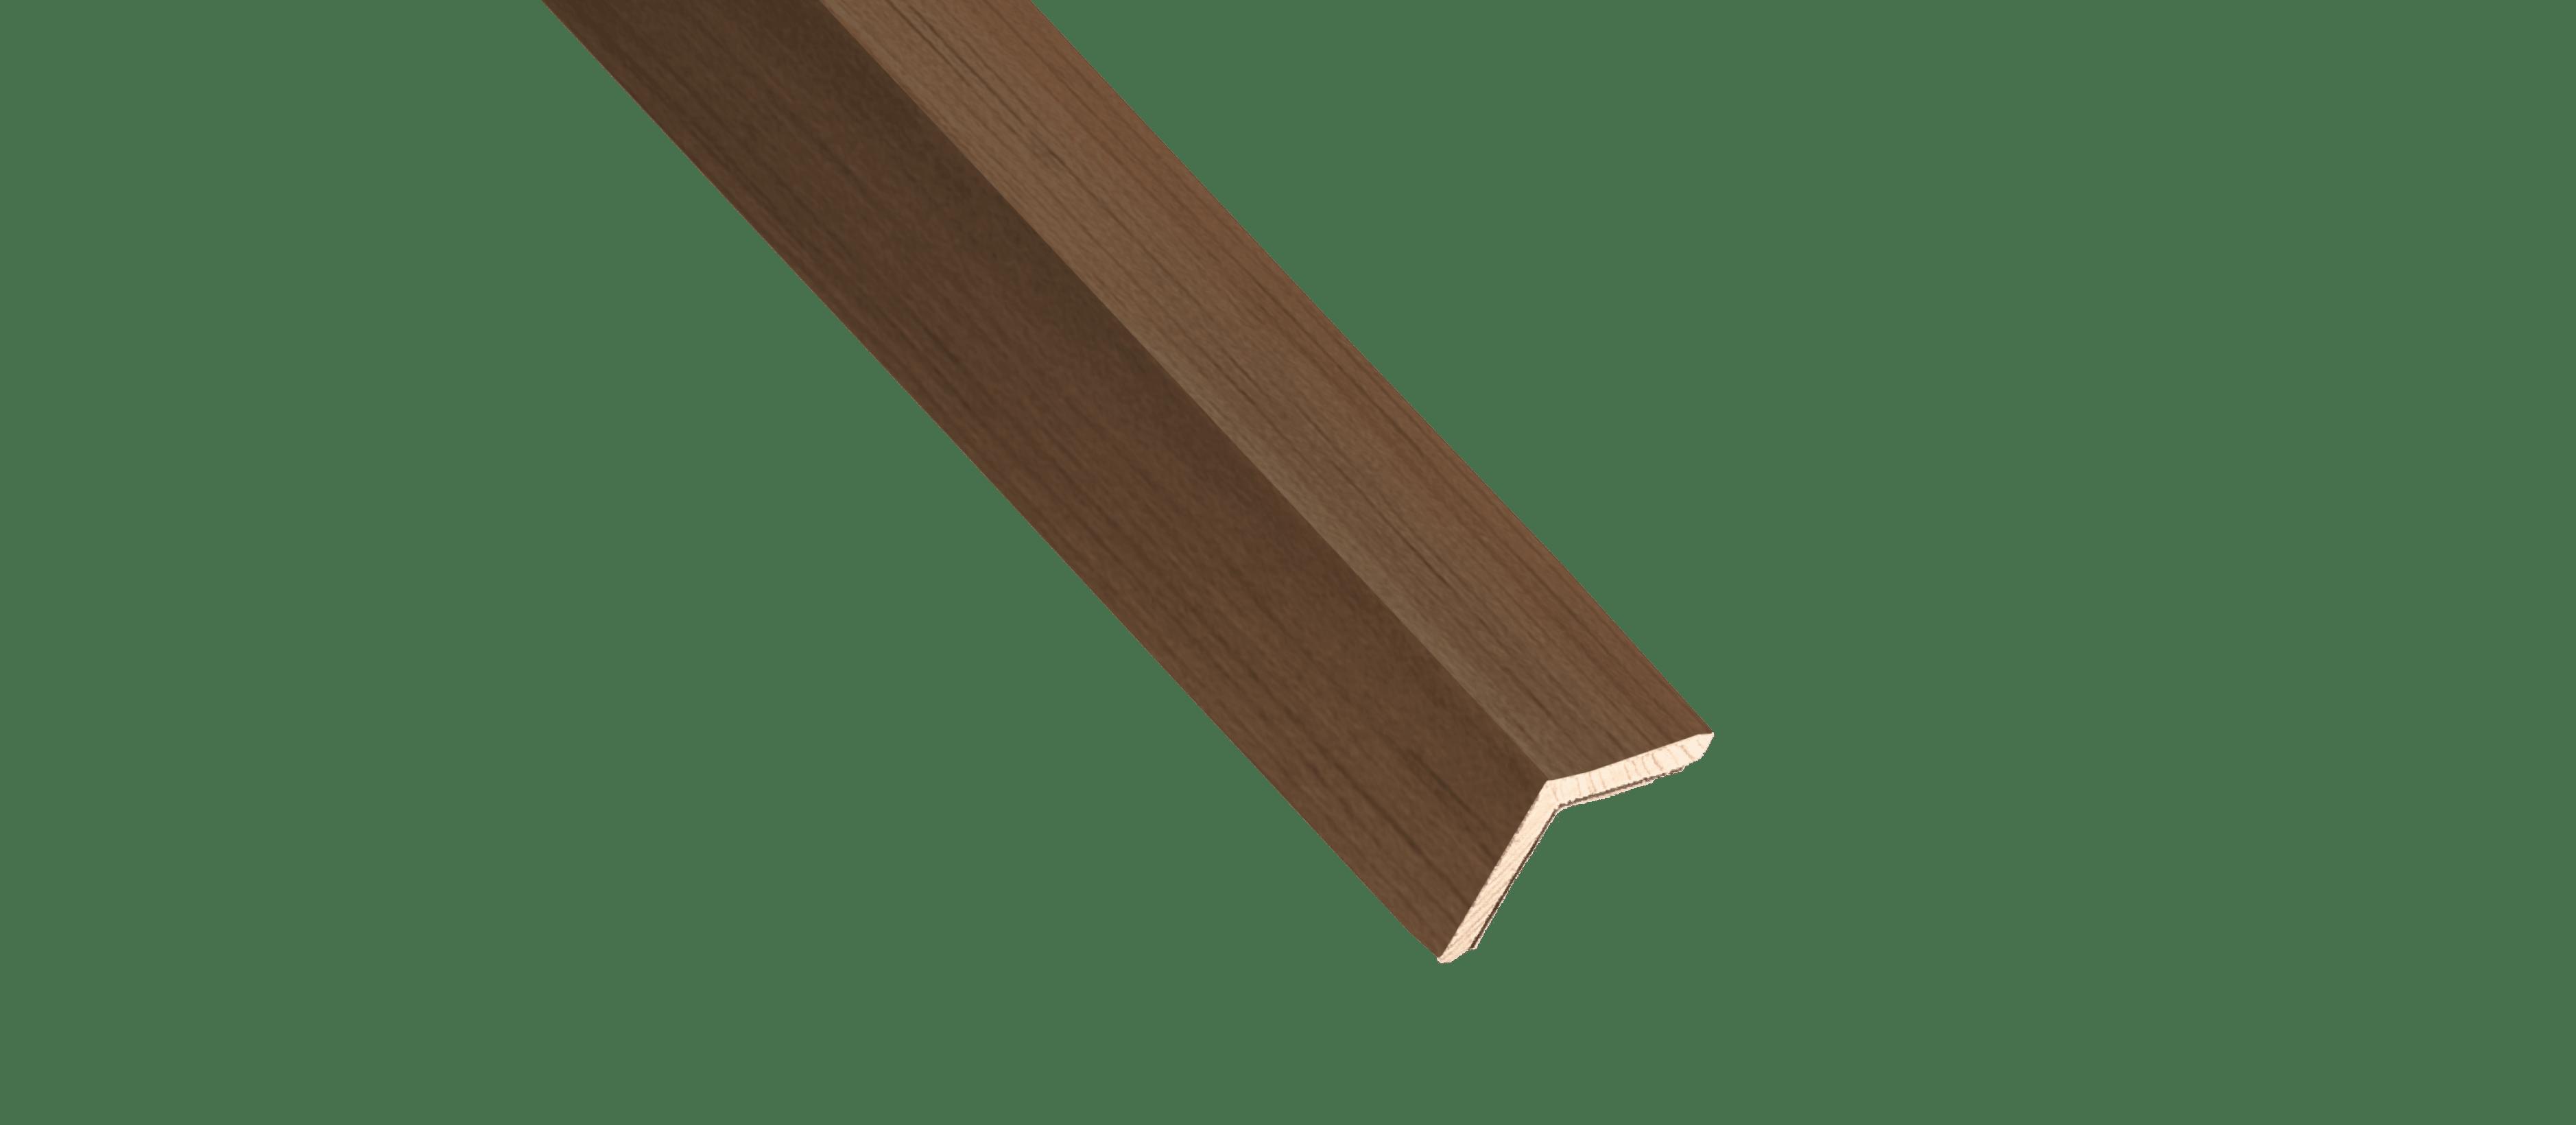 Reclaimed Arabica Wood Corner Trim Sample